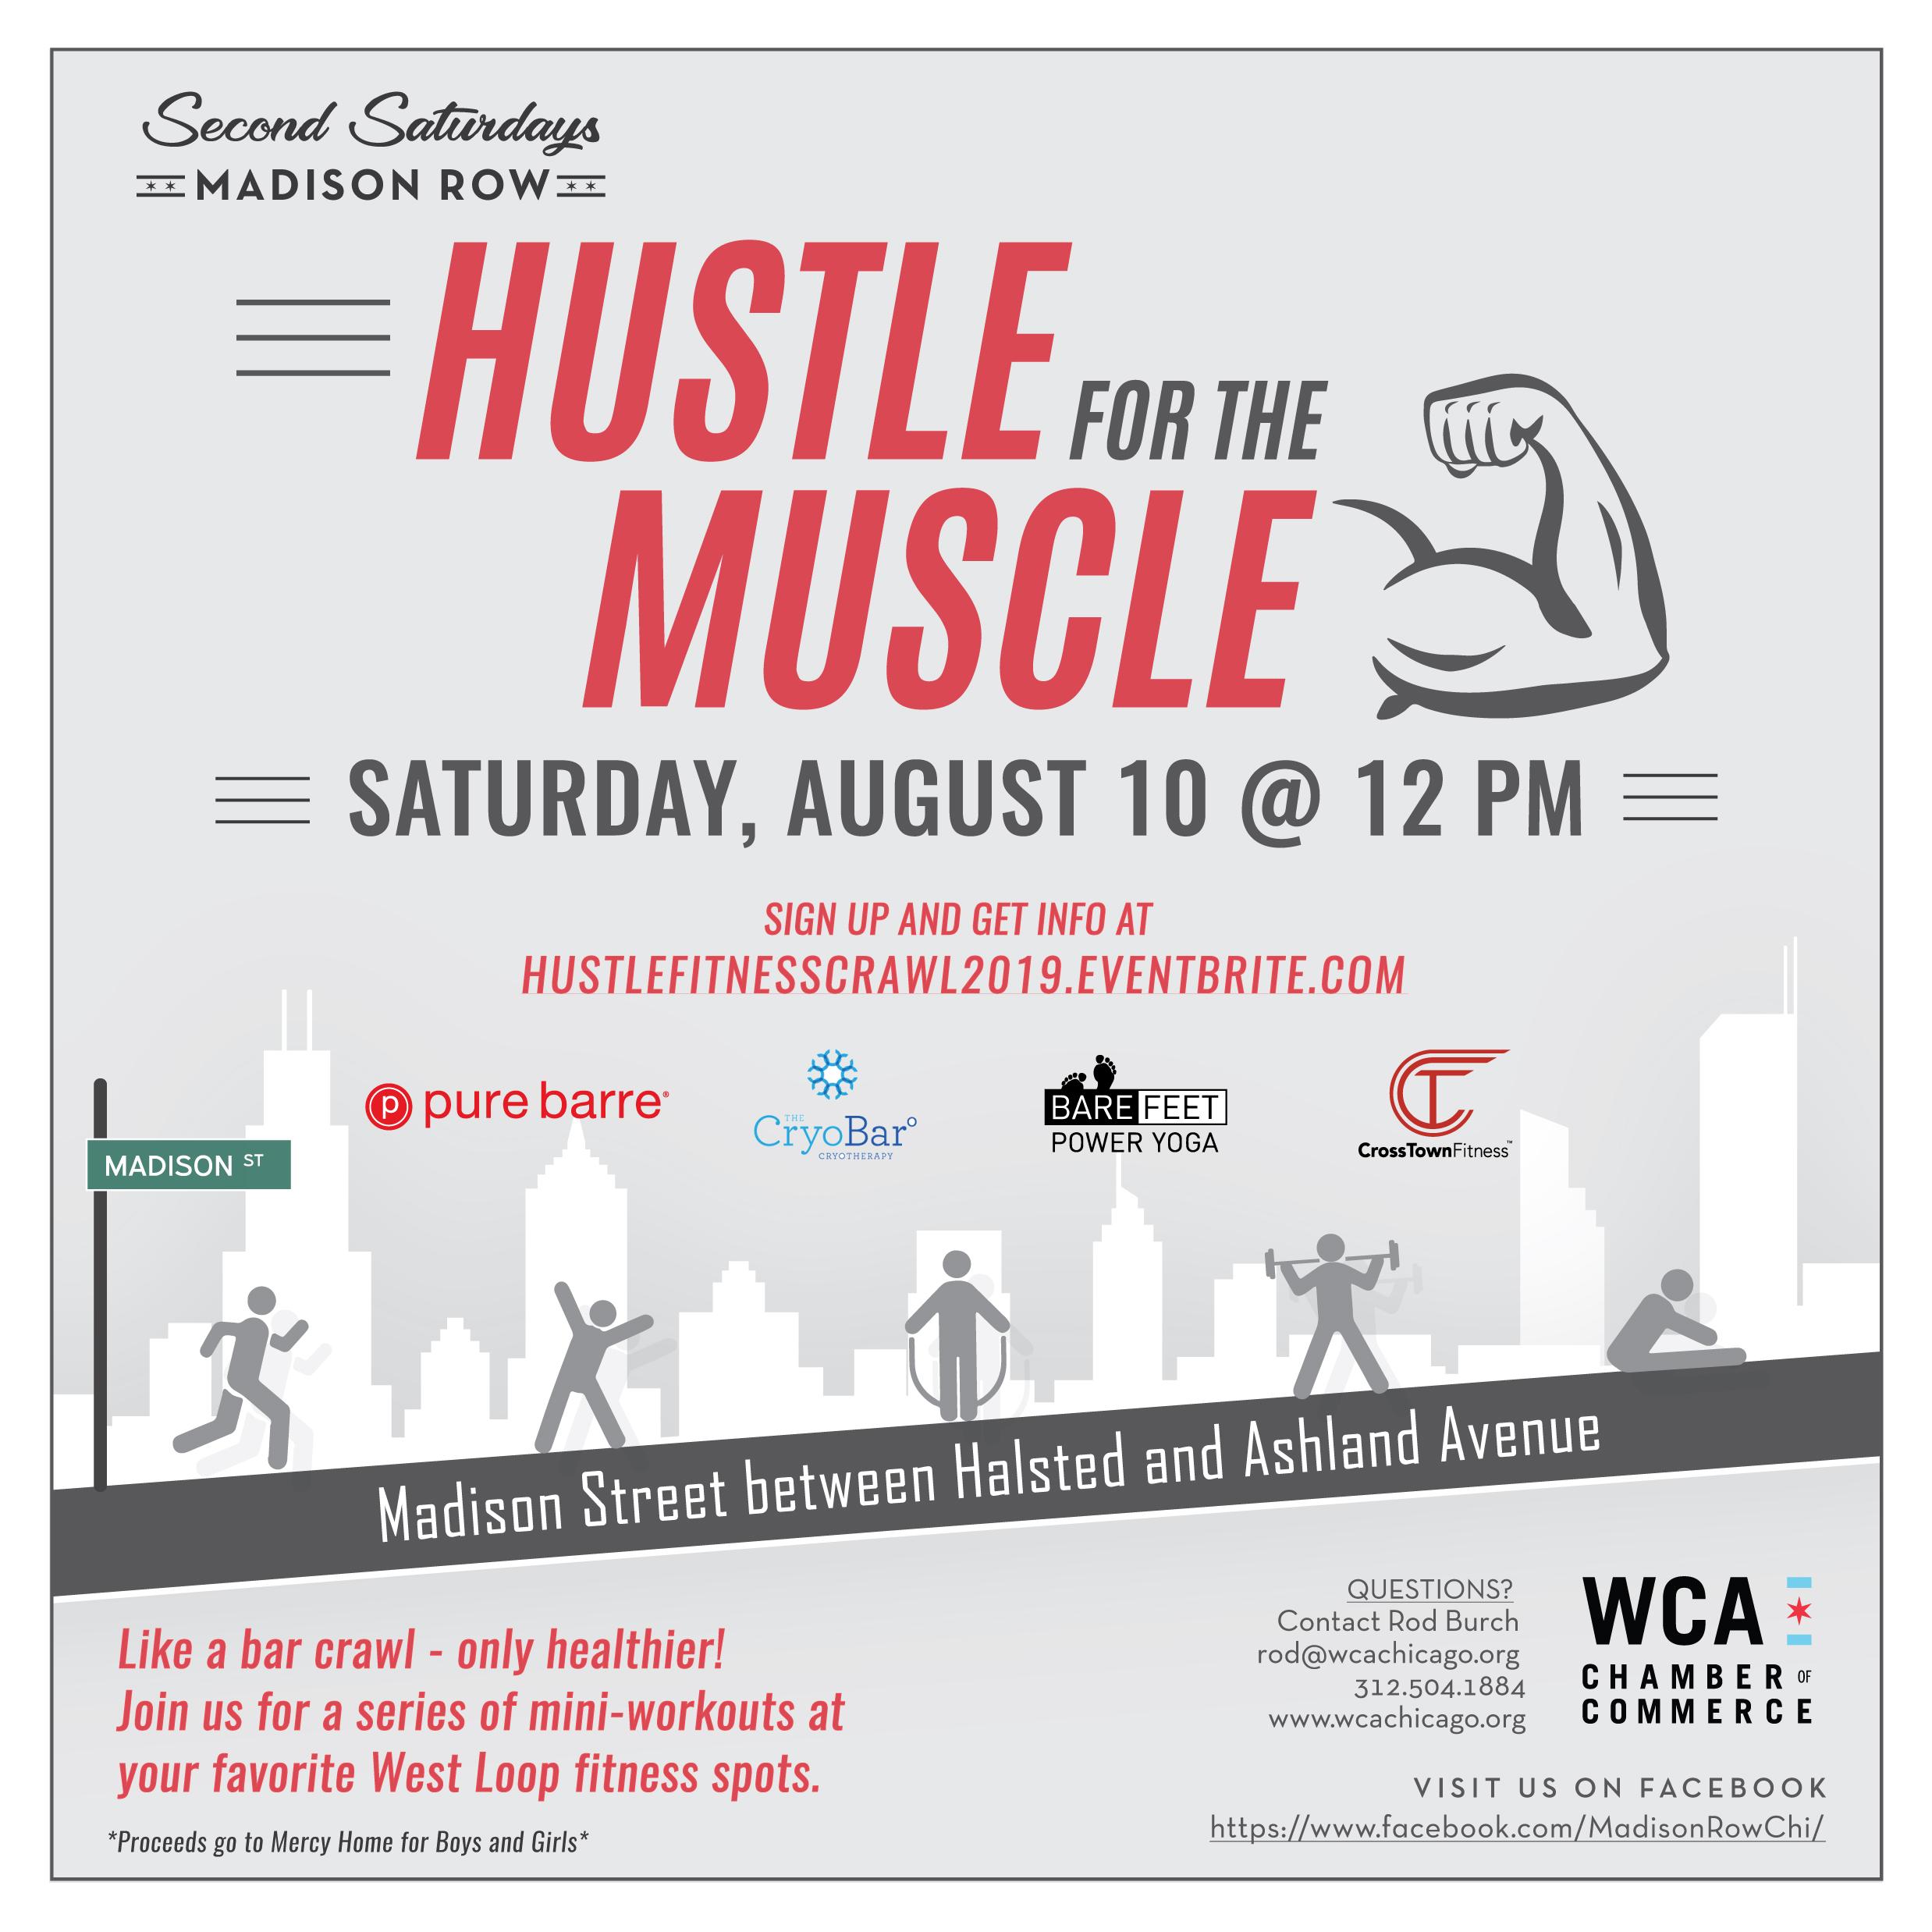 2019 Madison Row Saturday Events-Hustle-_INSTAGRAM POST.jpg